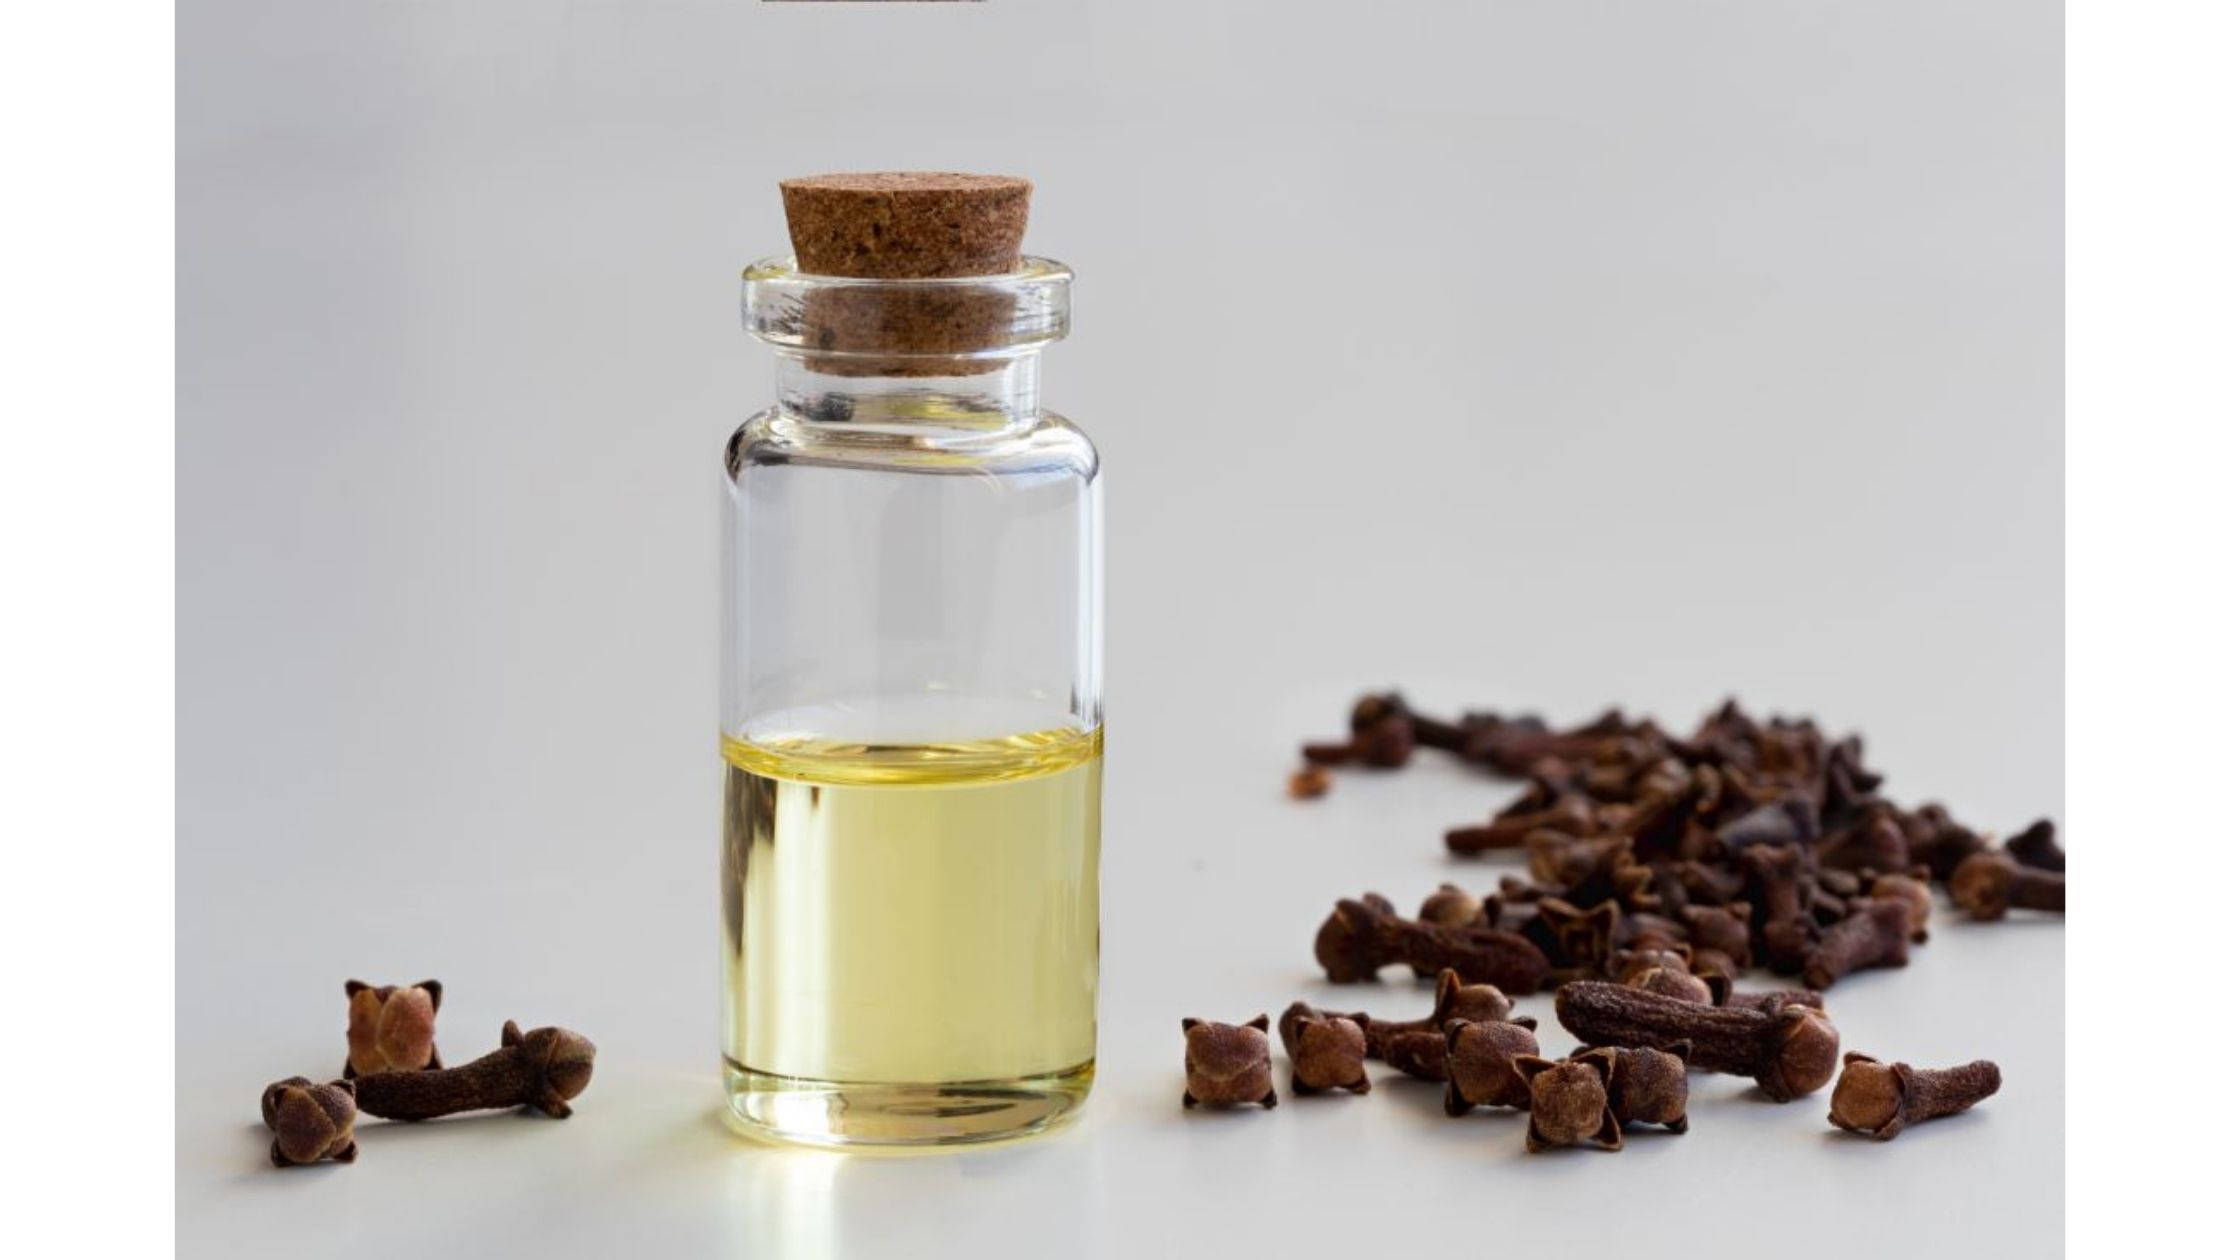 Cloves or clove oil